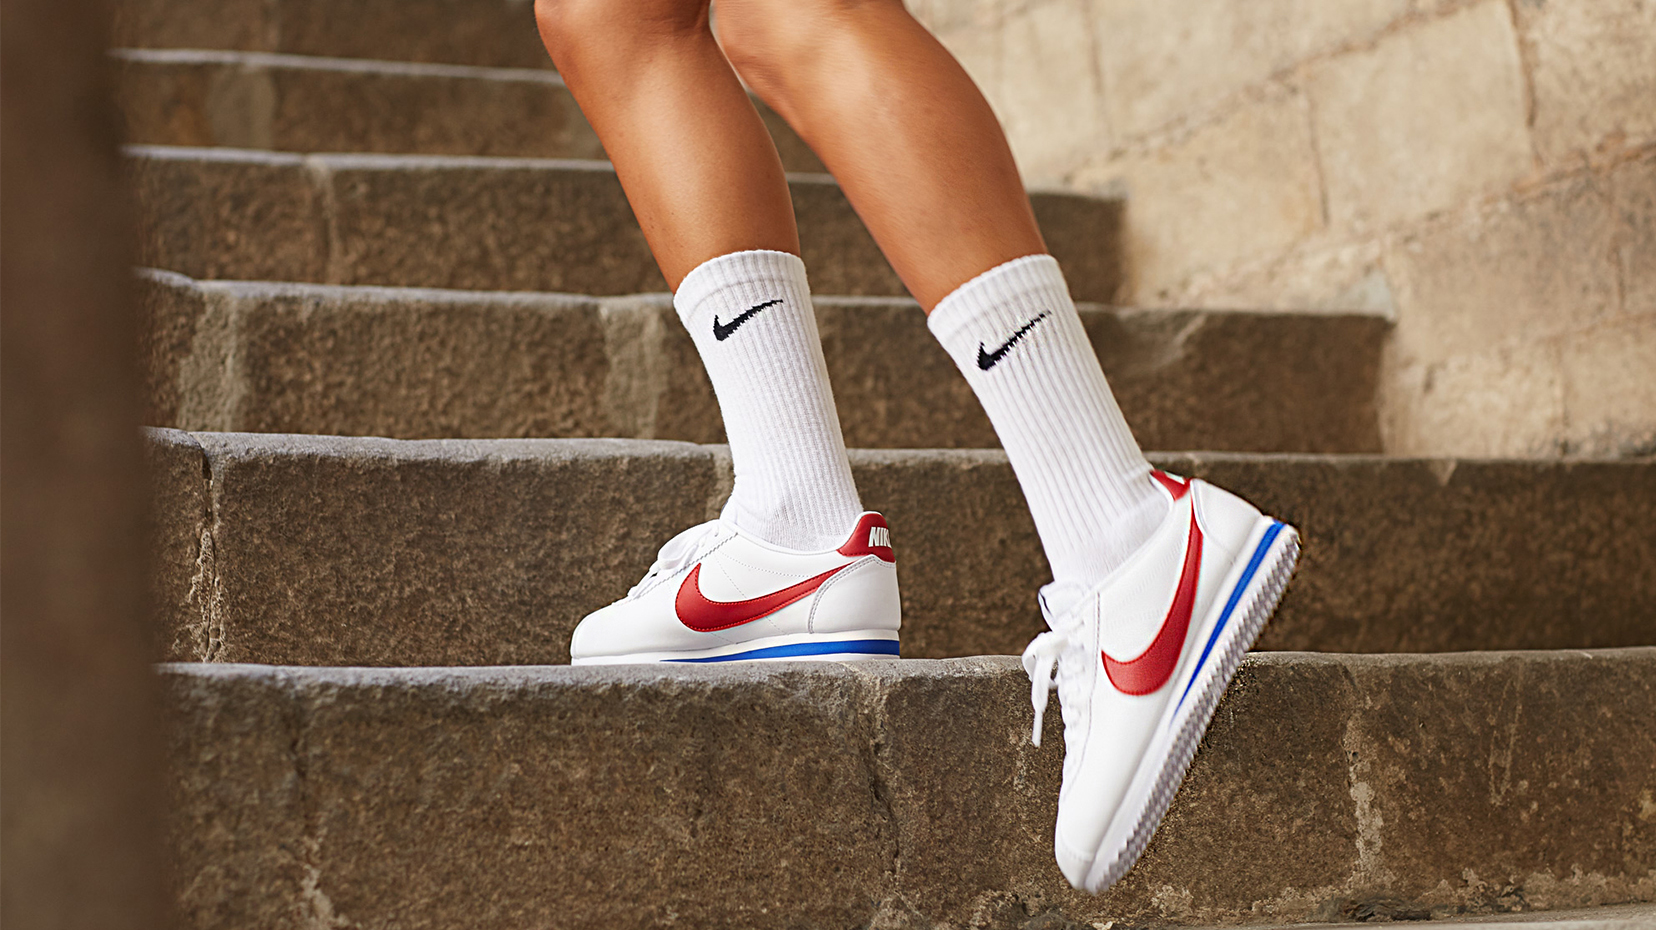 74cd0b8b4a2 Zapatillas Nike Cortez